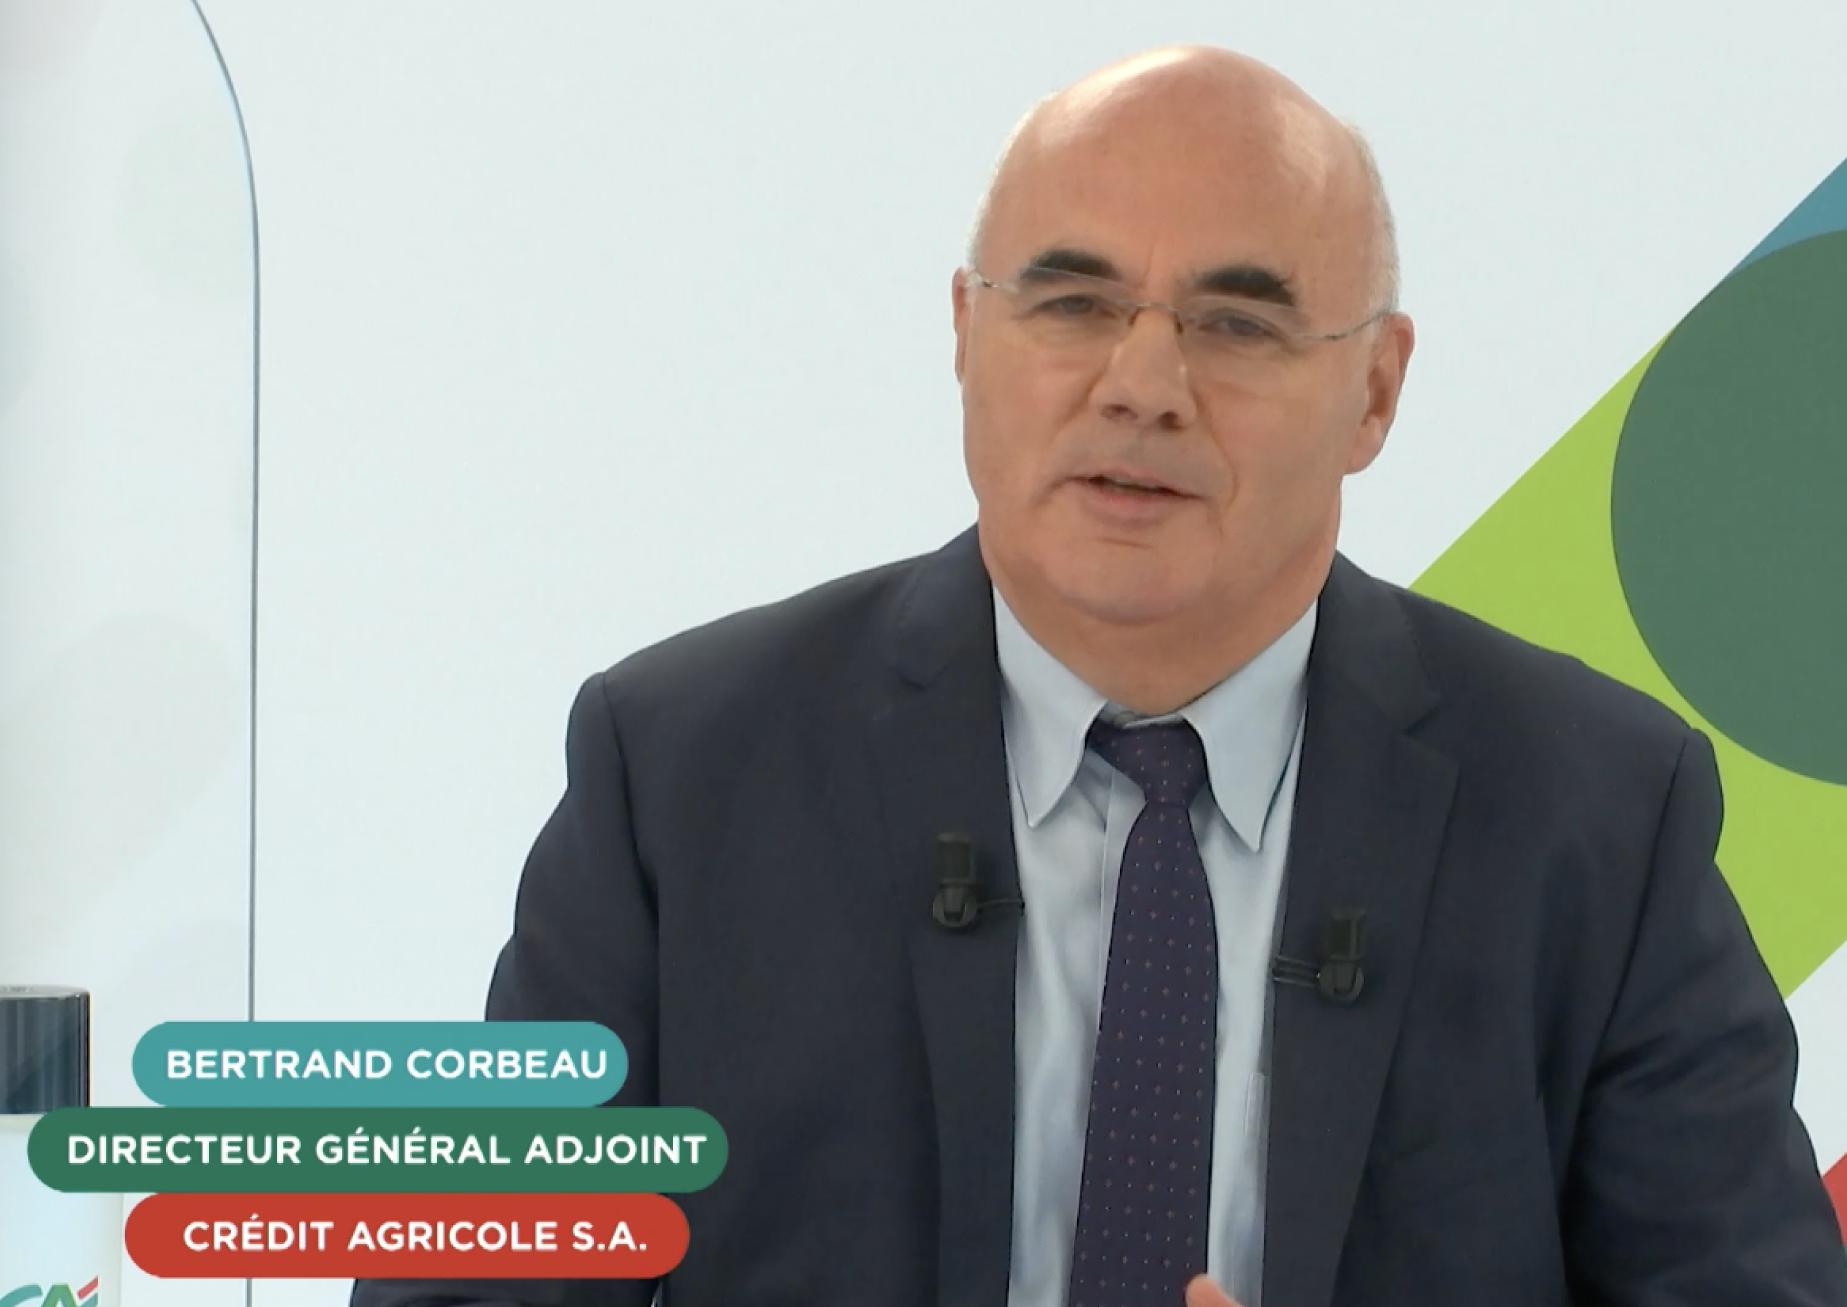 Bertrand Corbeau DGA Crédit Agricole PMA Days 2021